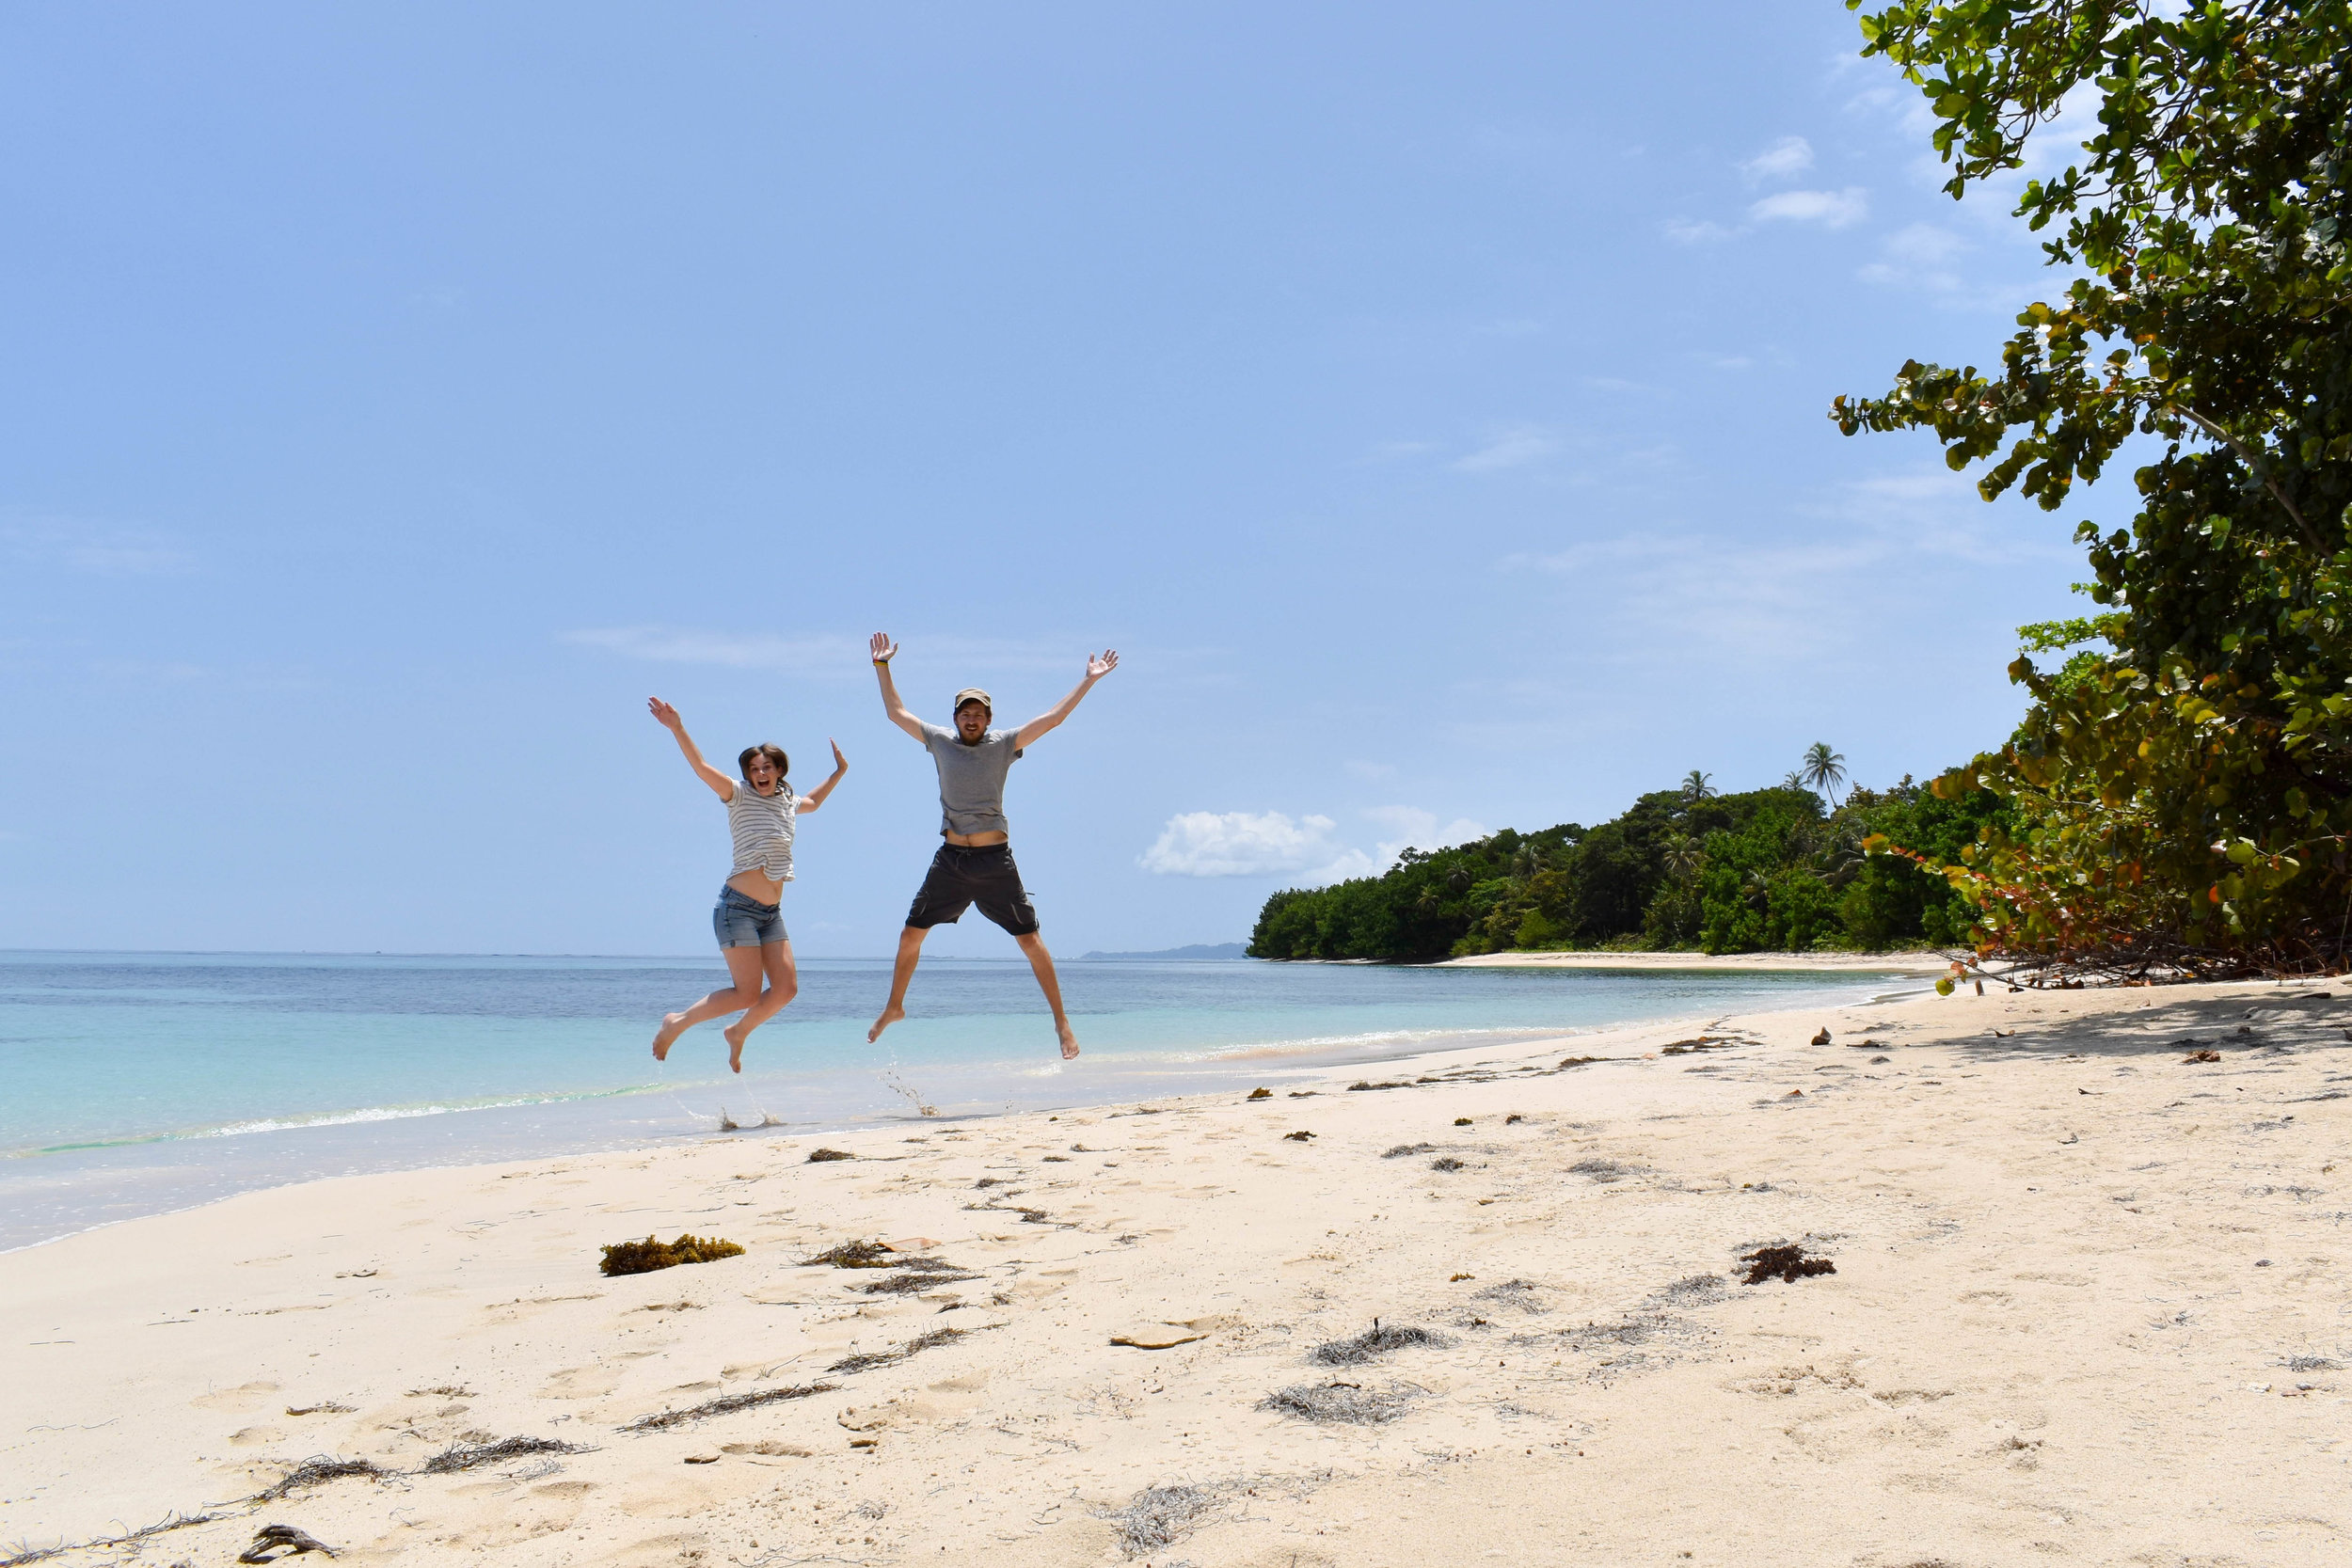 Jumping for Joy on Cayo Zapatilla in Panama